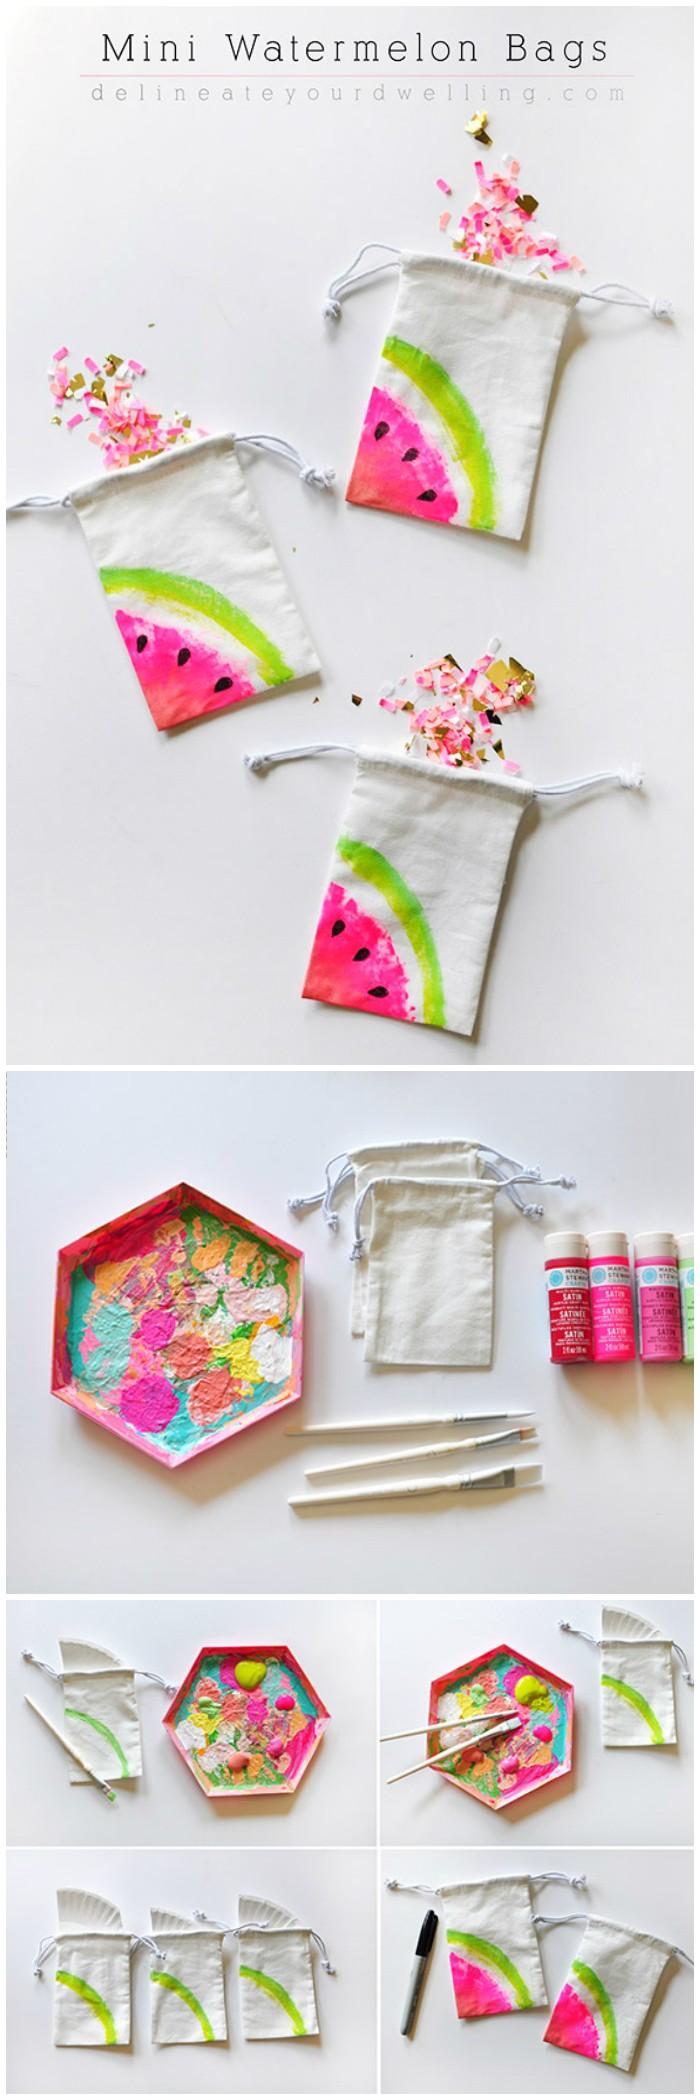 Mini Watermelon Bags